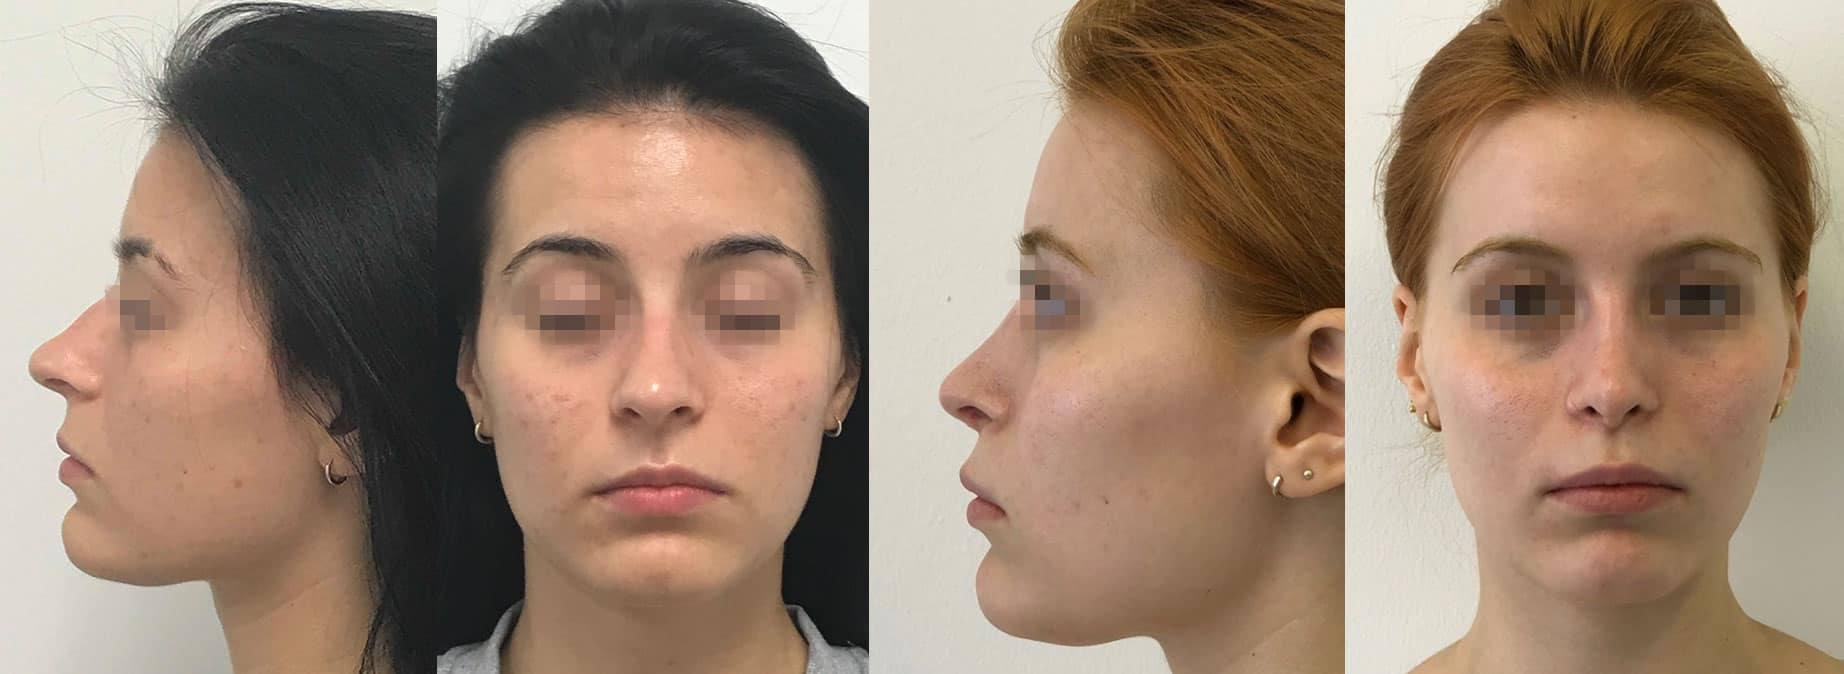 Rhinoplastik, Ästhetische Nasenkorrektur, plastische Operation